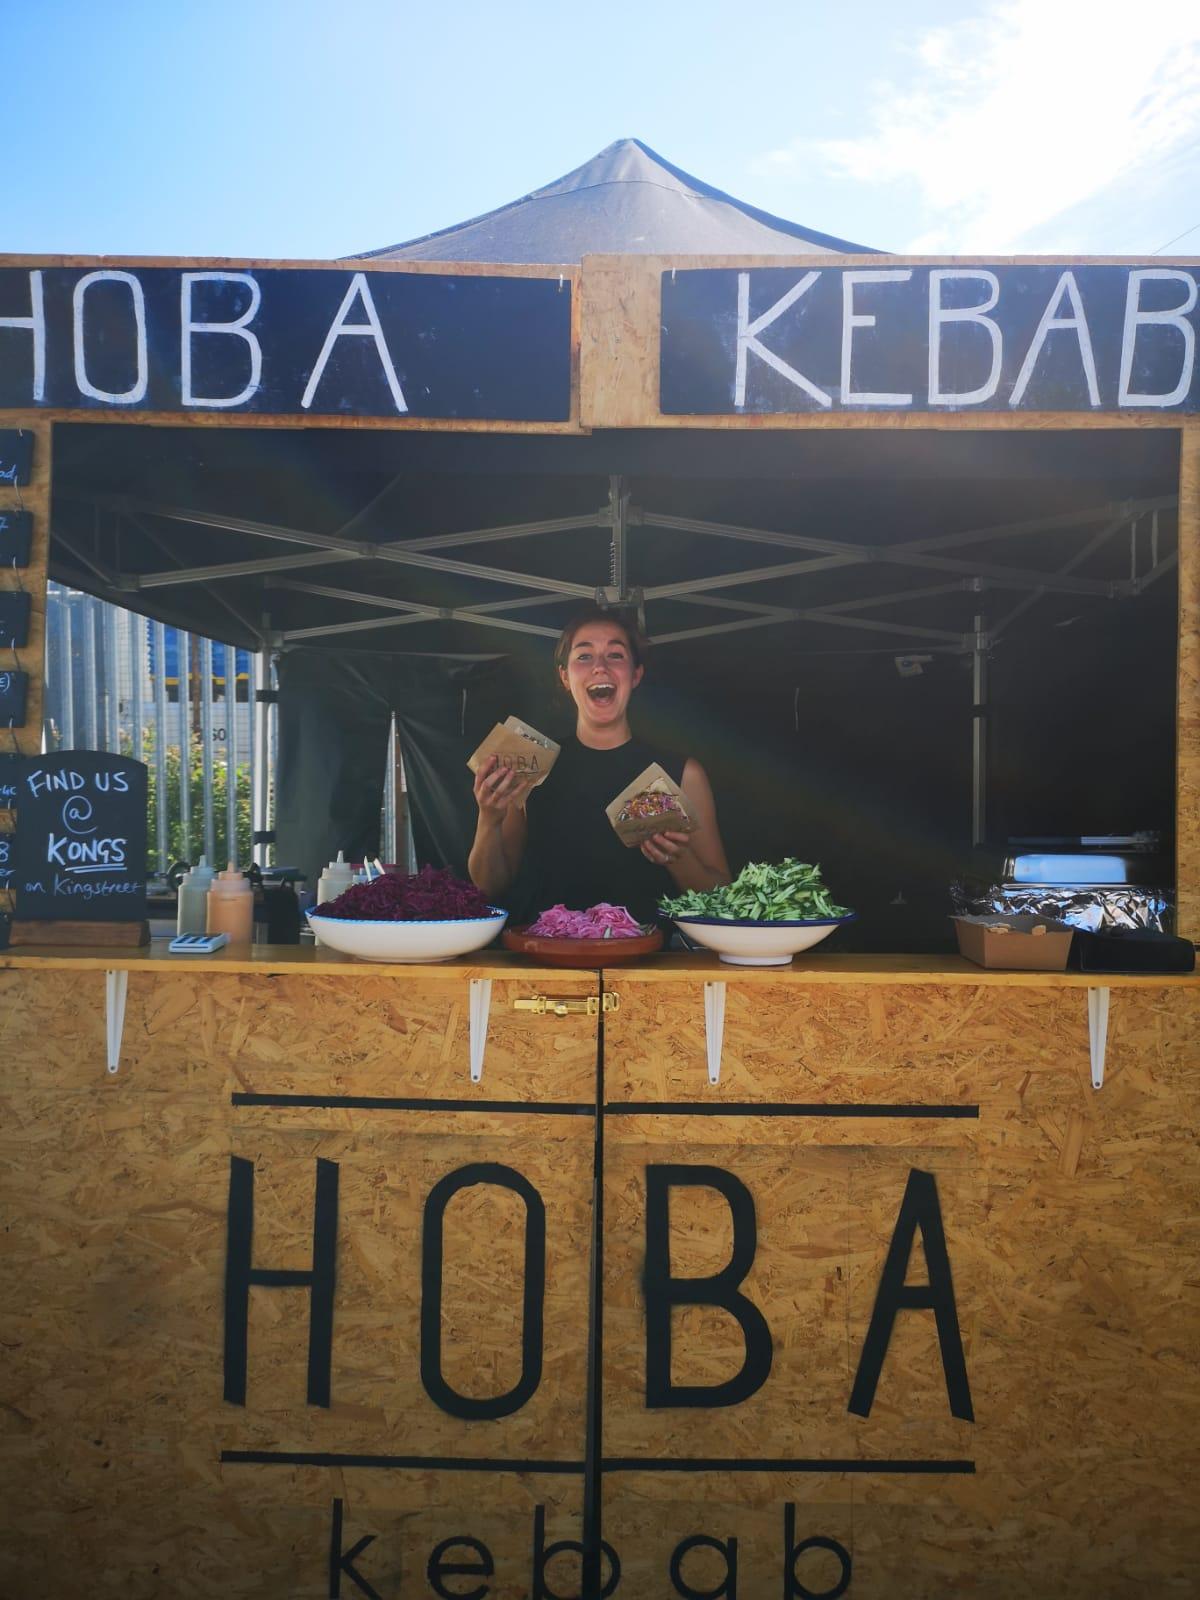 Hoba kebab market stall